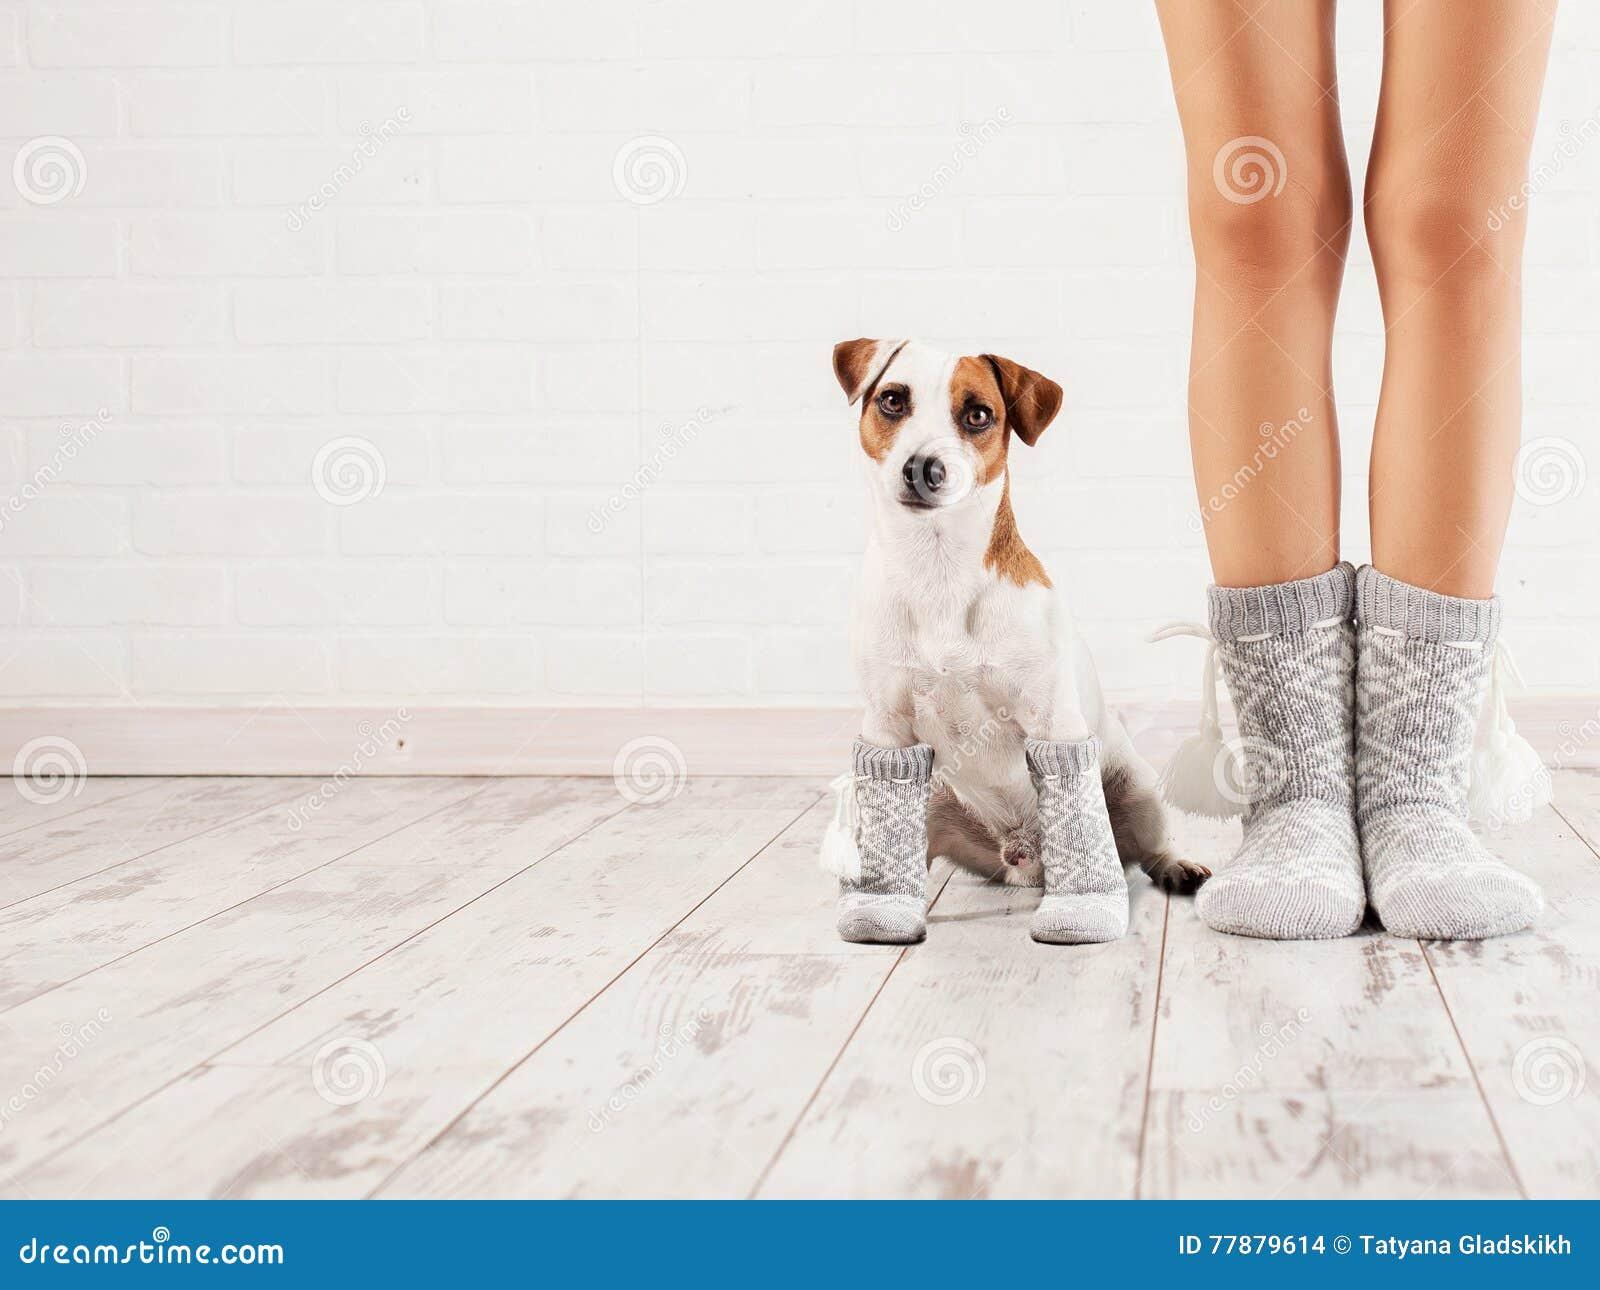 Wijfje en hond in sokken